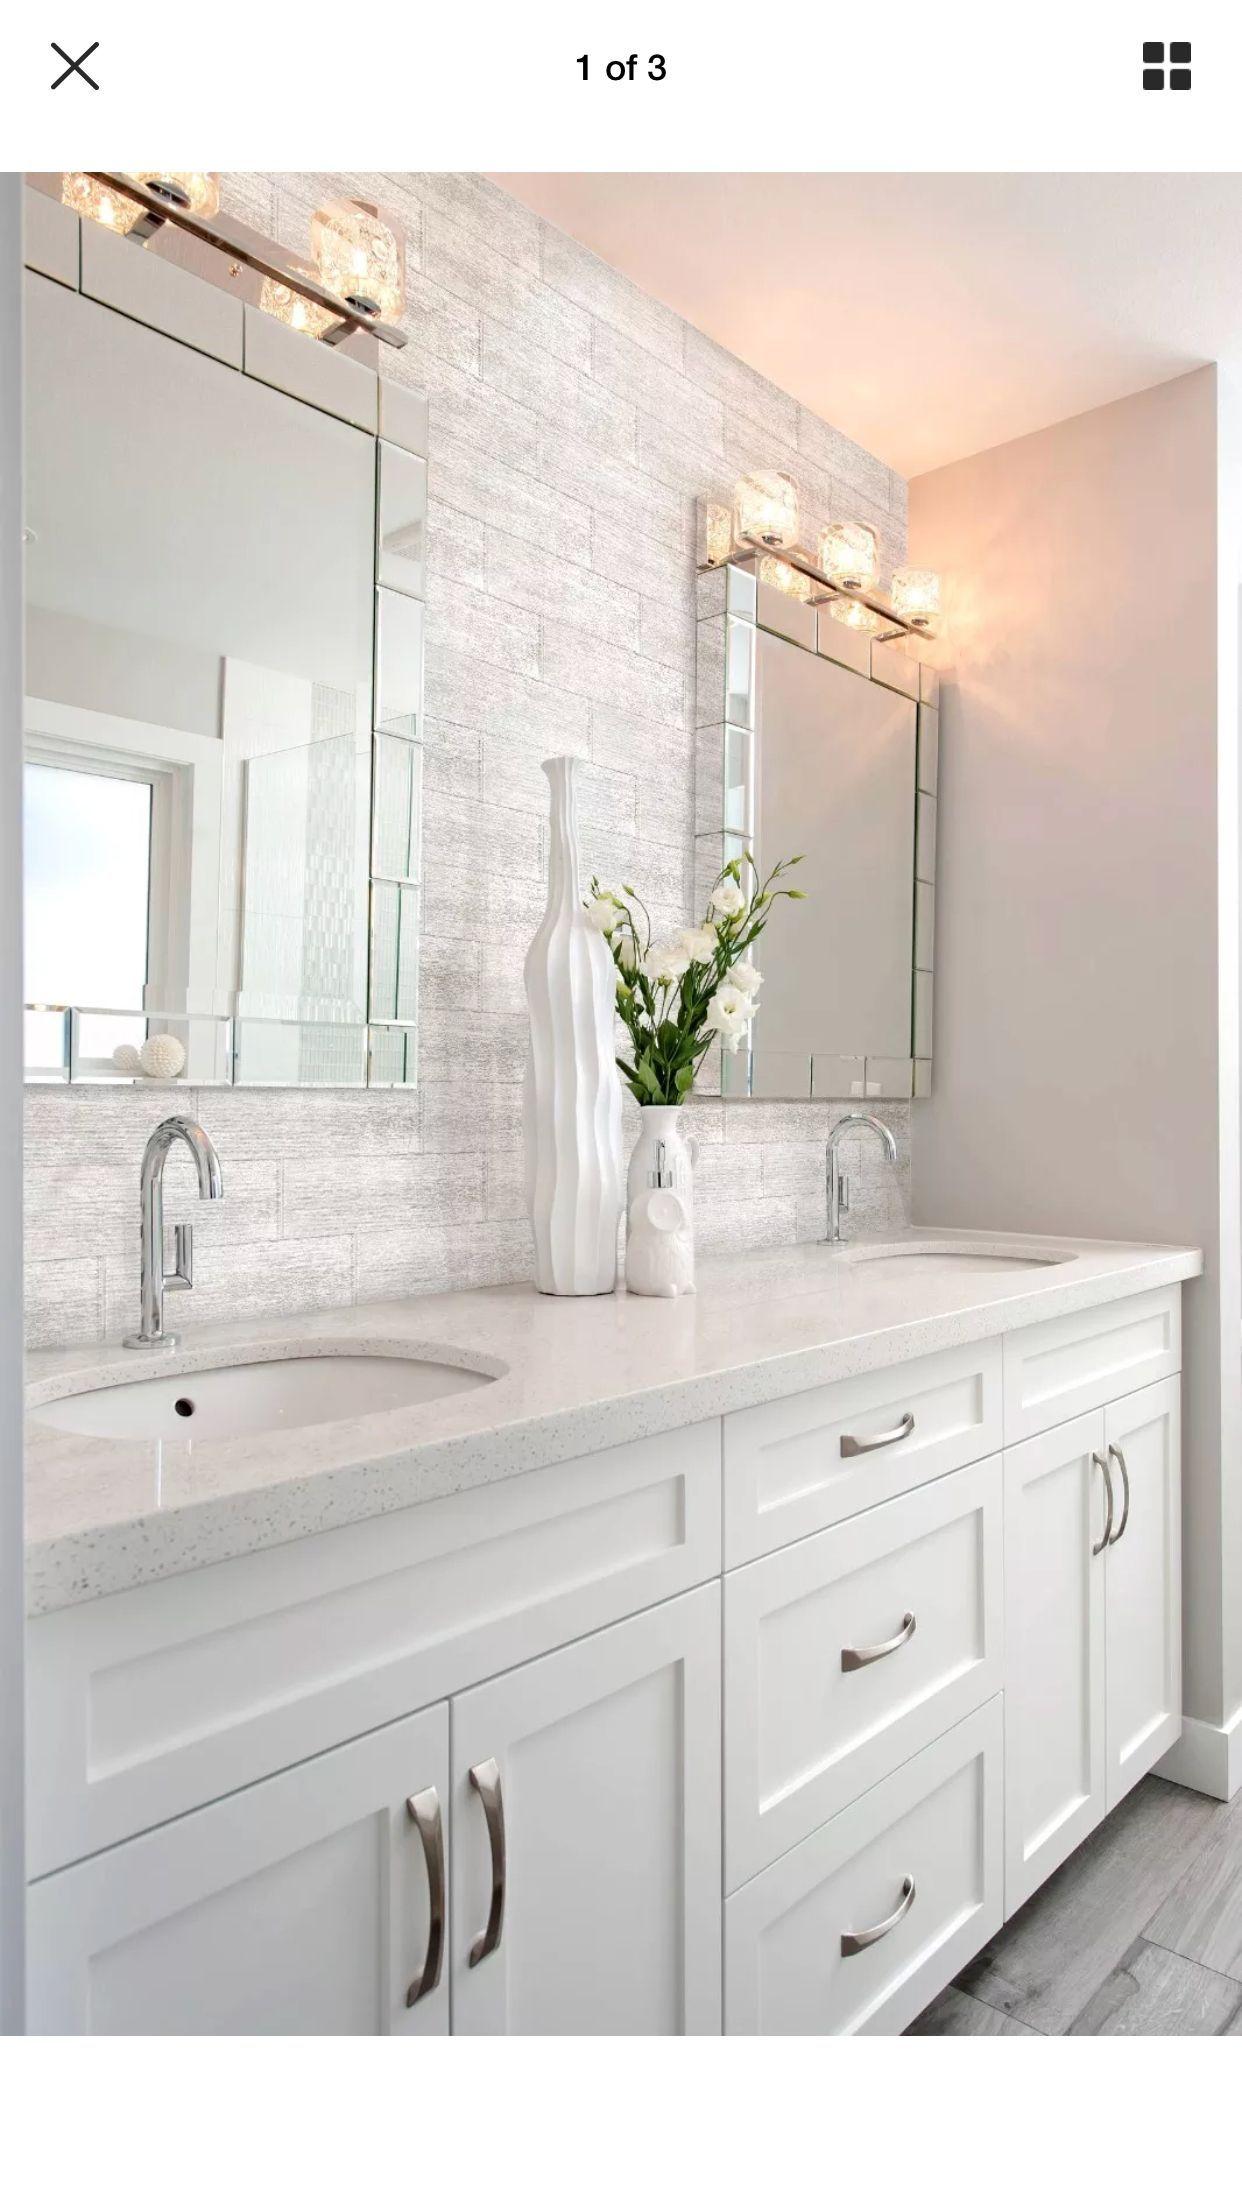 Top 10 Double Bathroom Vanity Design Ideas Double Vanity Bathroom Bathroom Vanity Designs Vanity Design